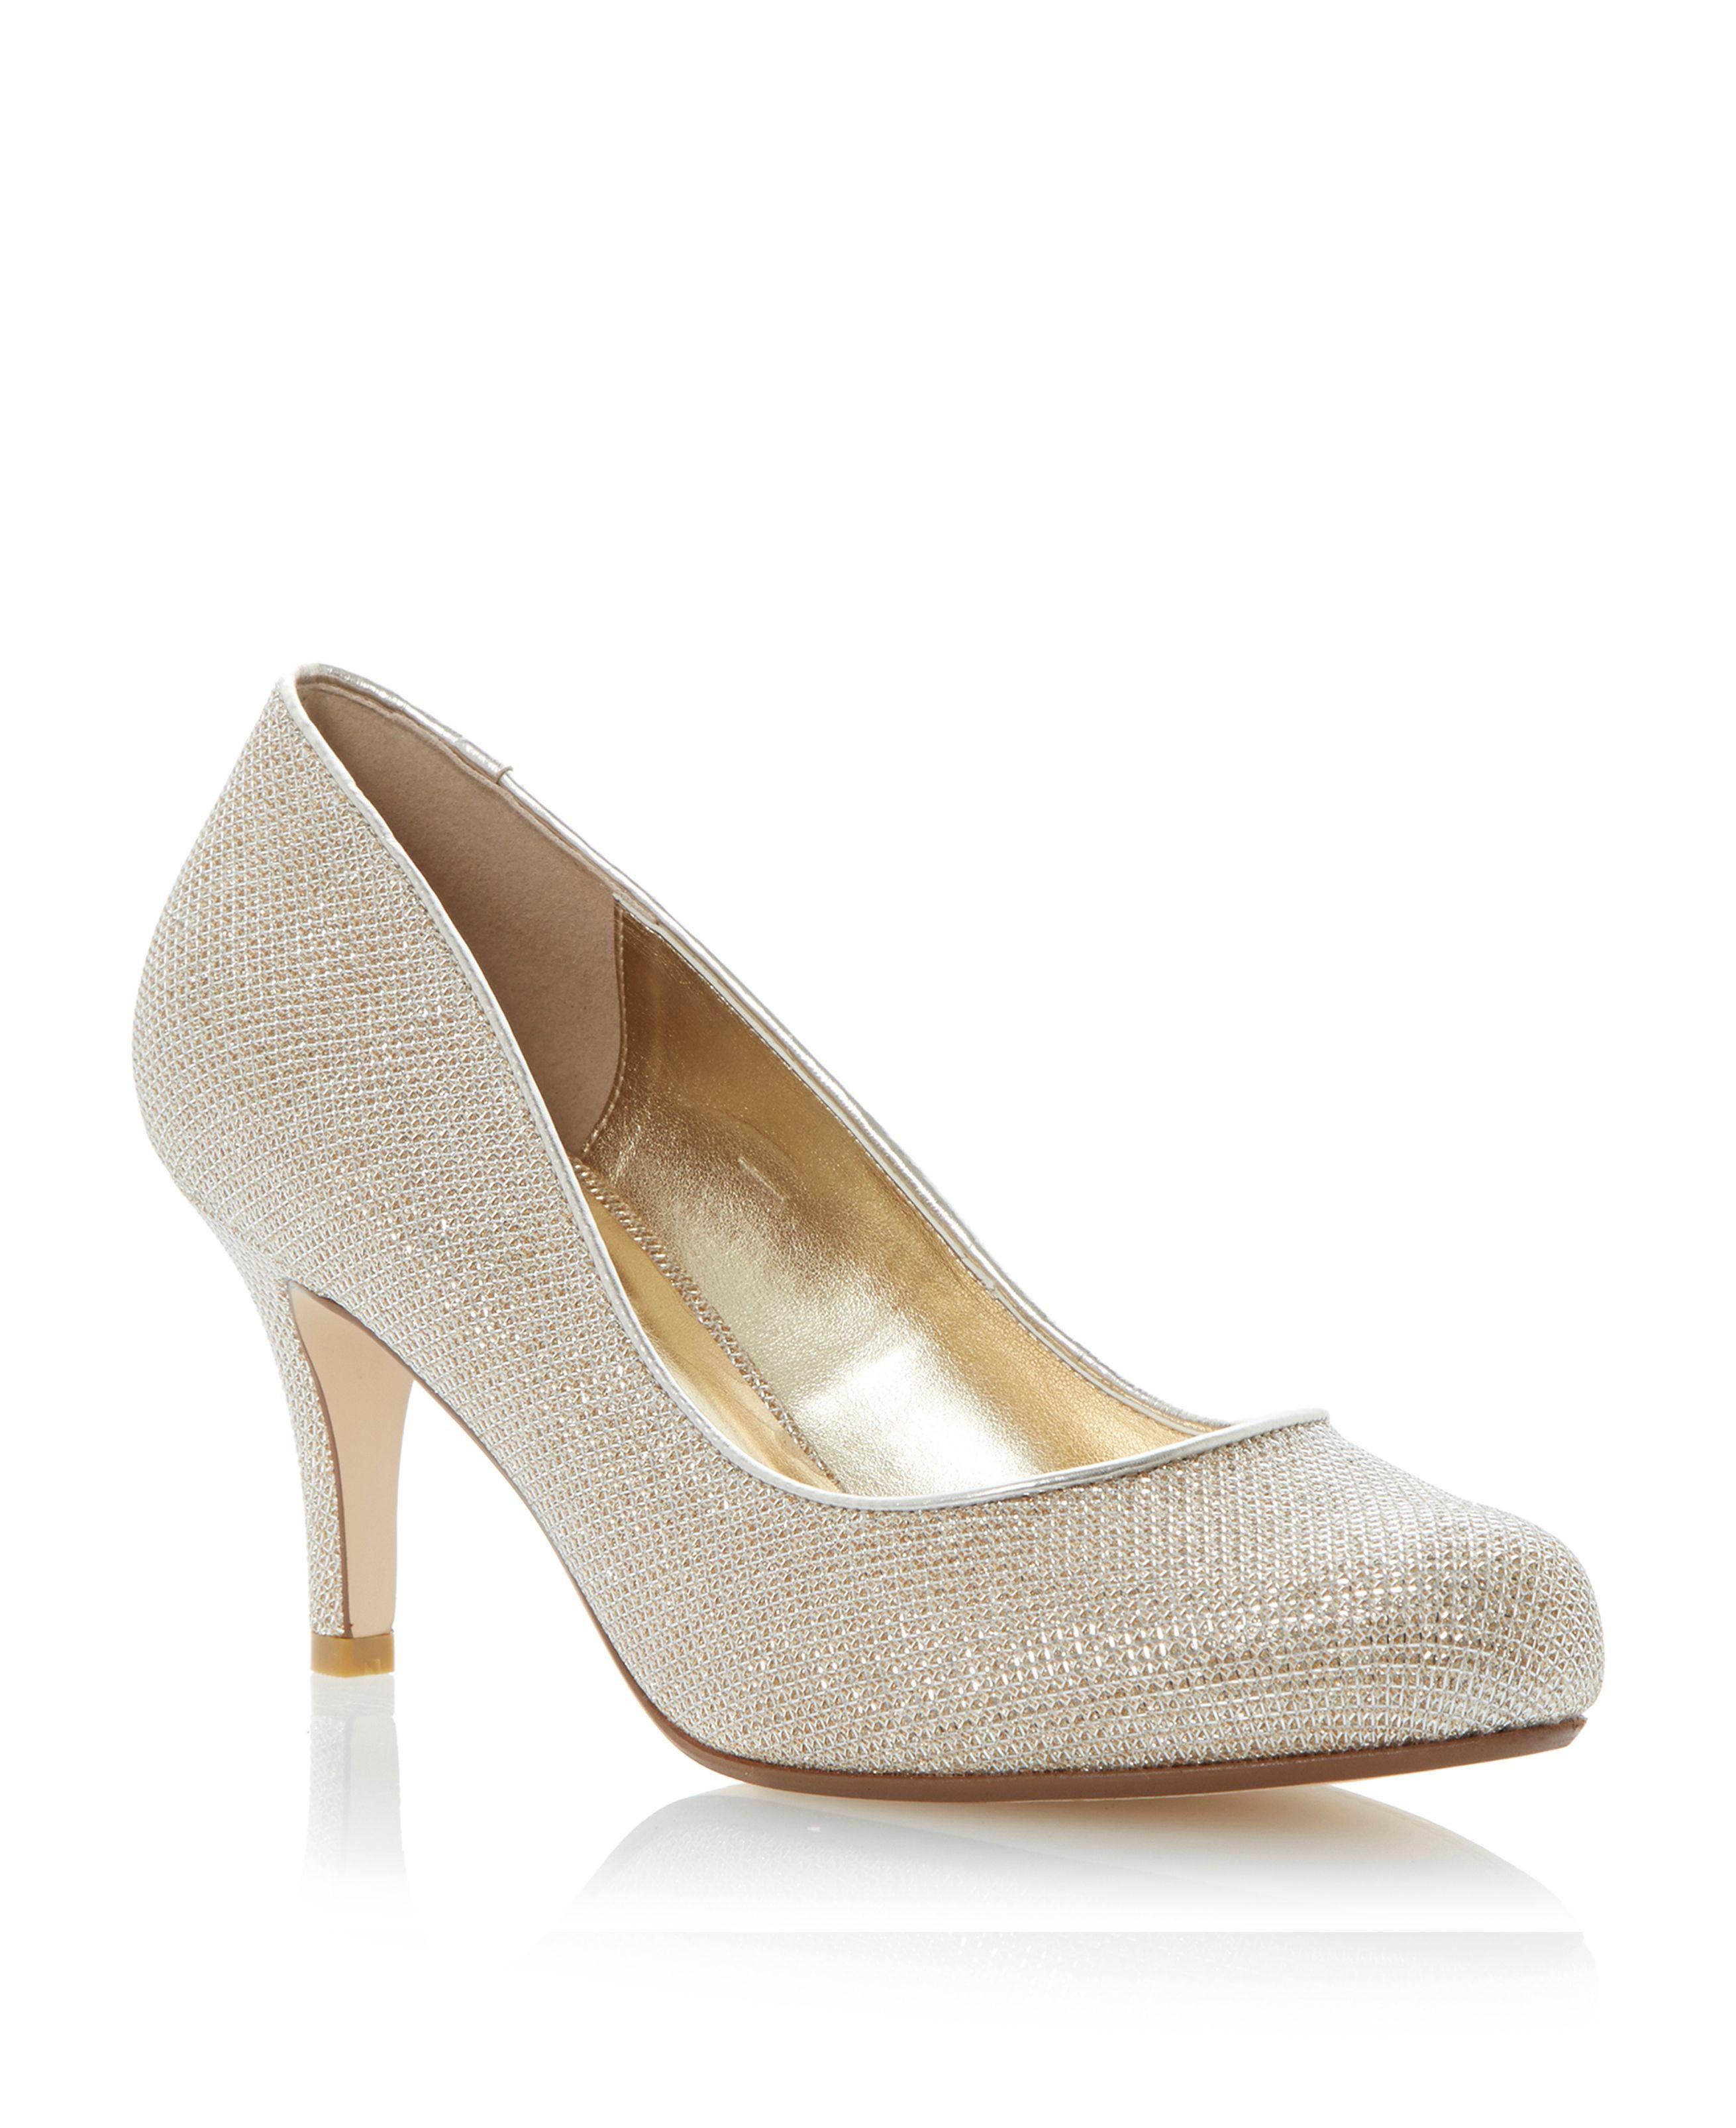 6c8a3ed7a042 Dune Amelia mid heel court shoes